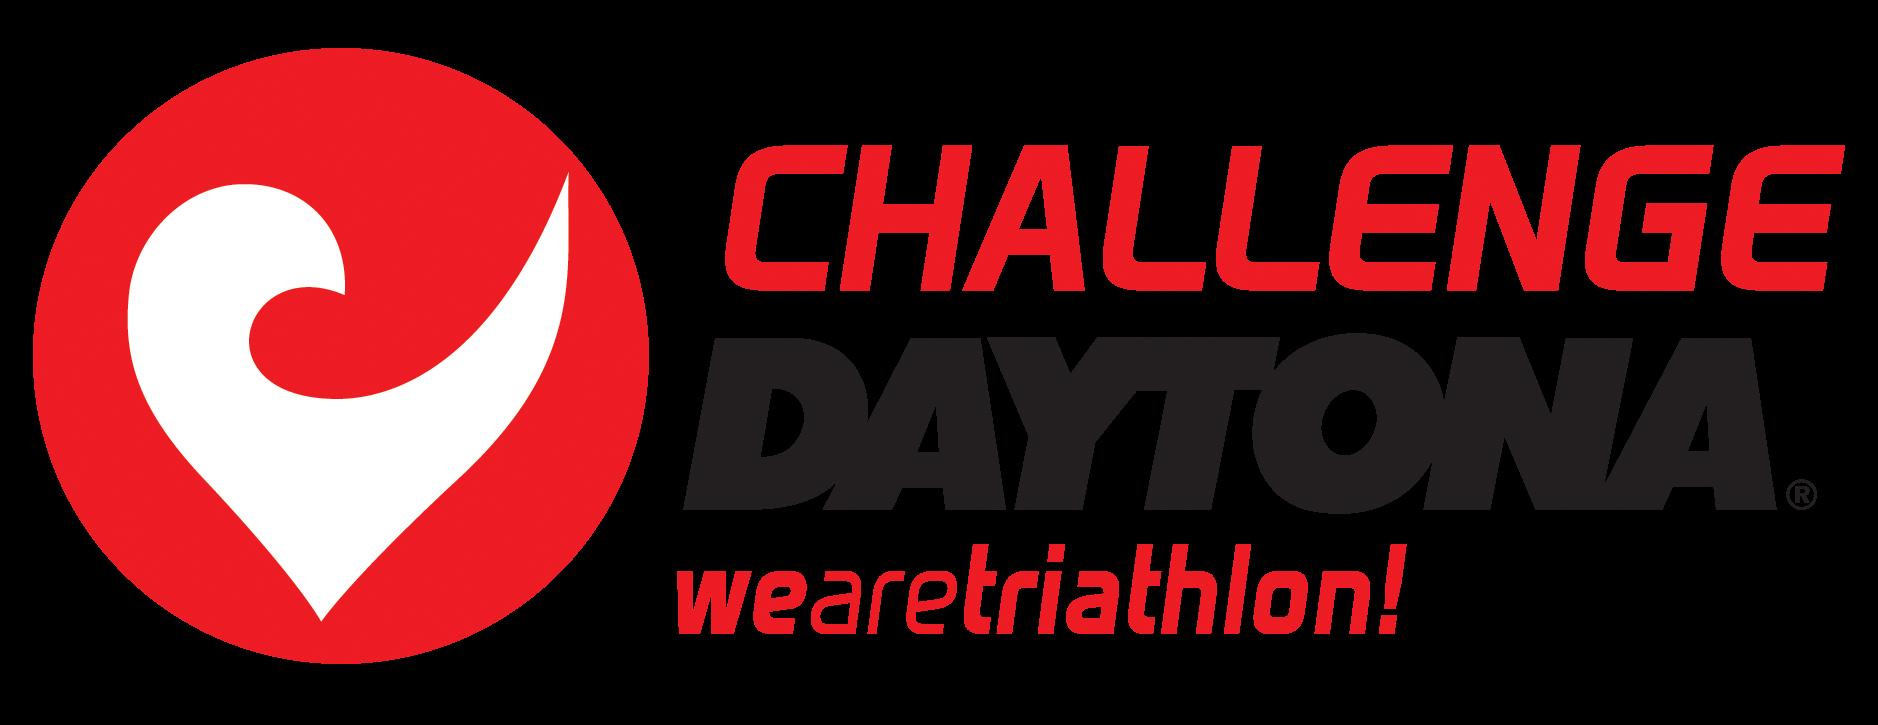 Challenge-Daytona-horizontal Event